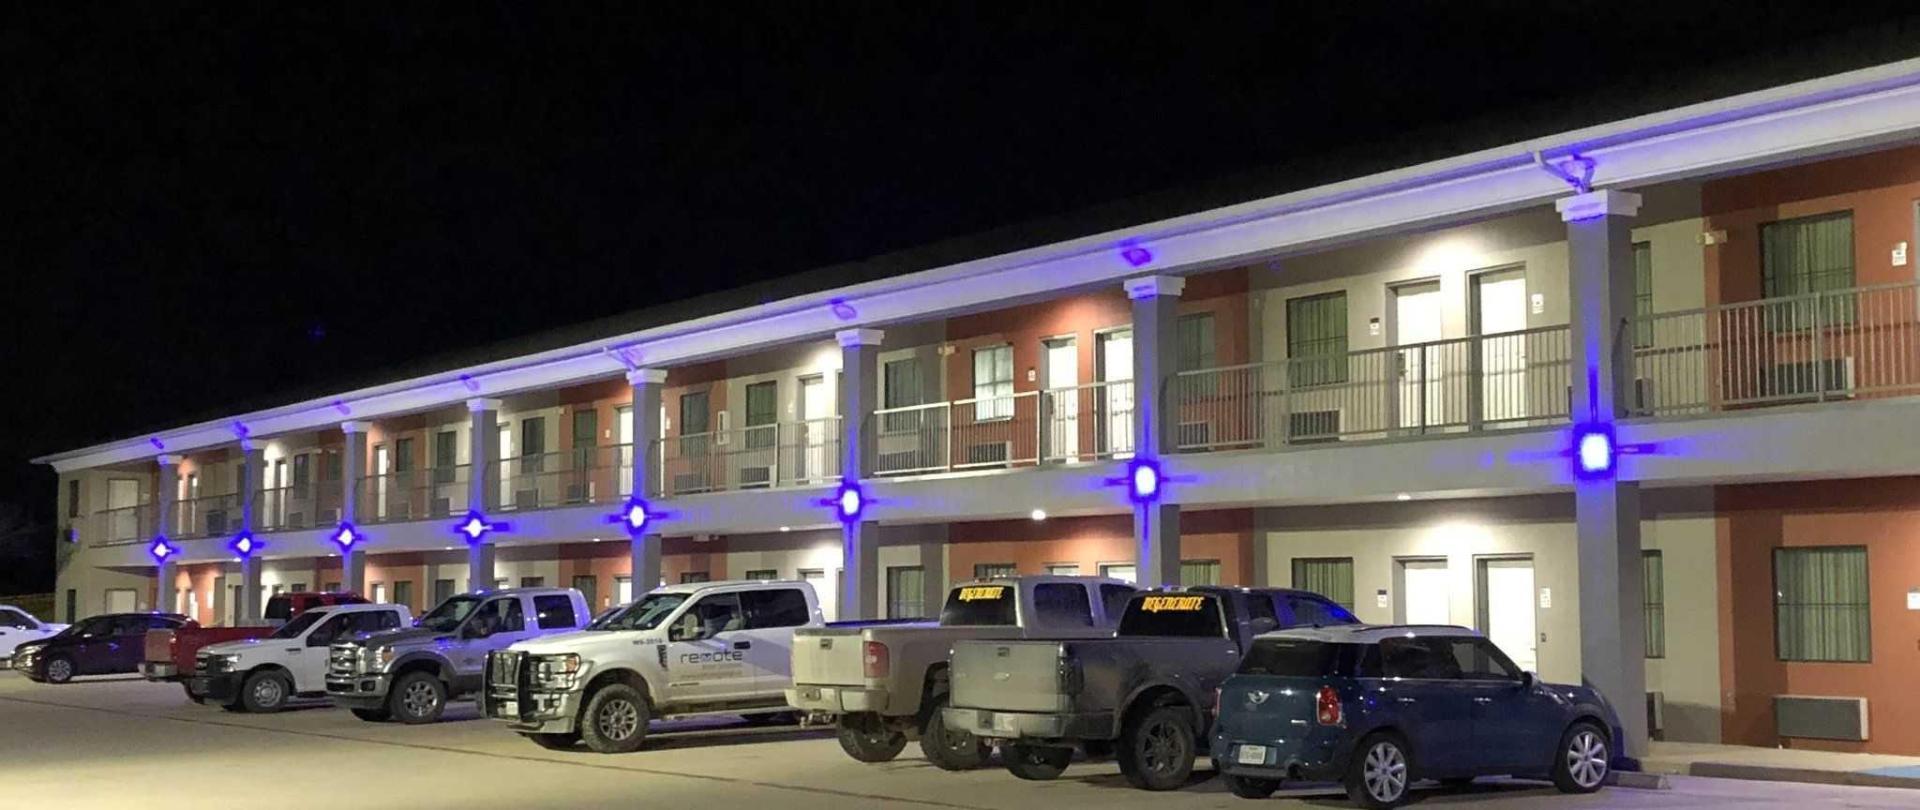 exterior-building-night-view.jpg